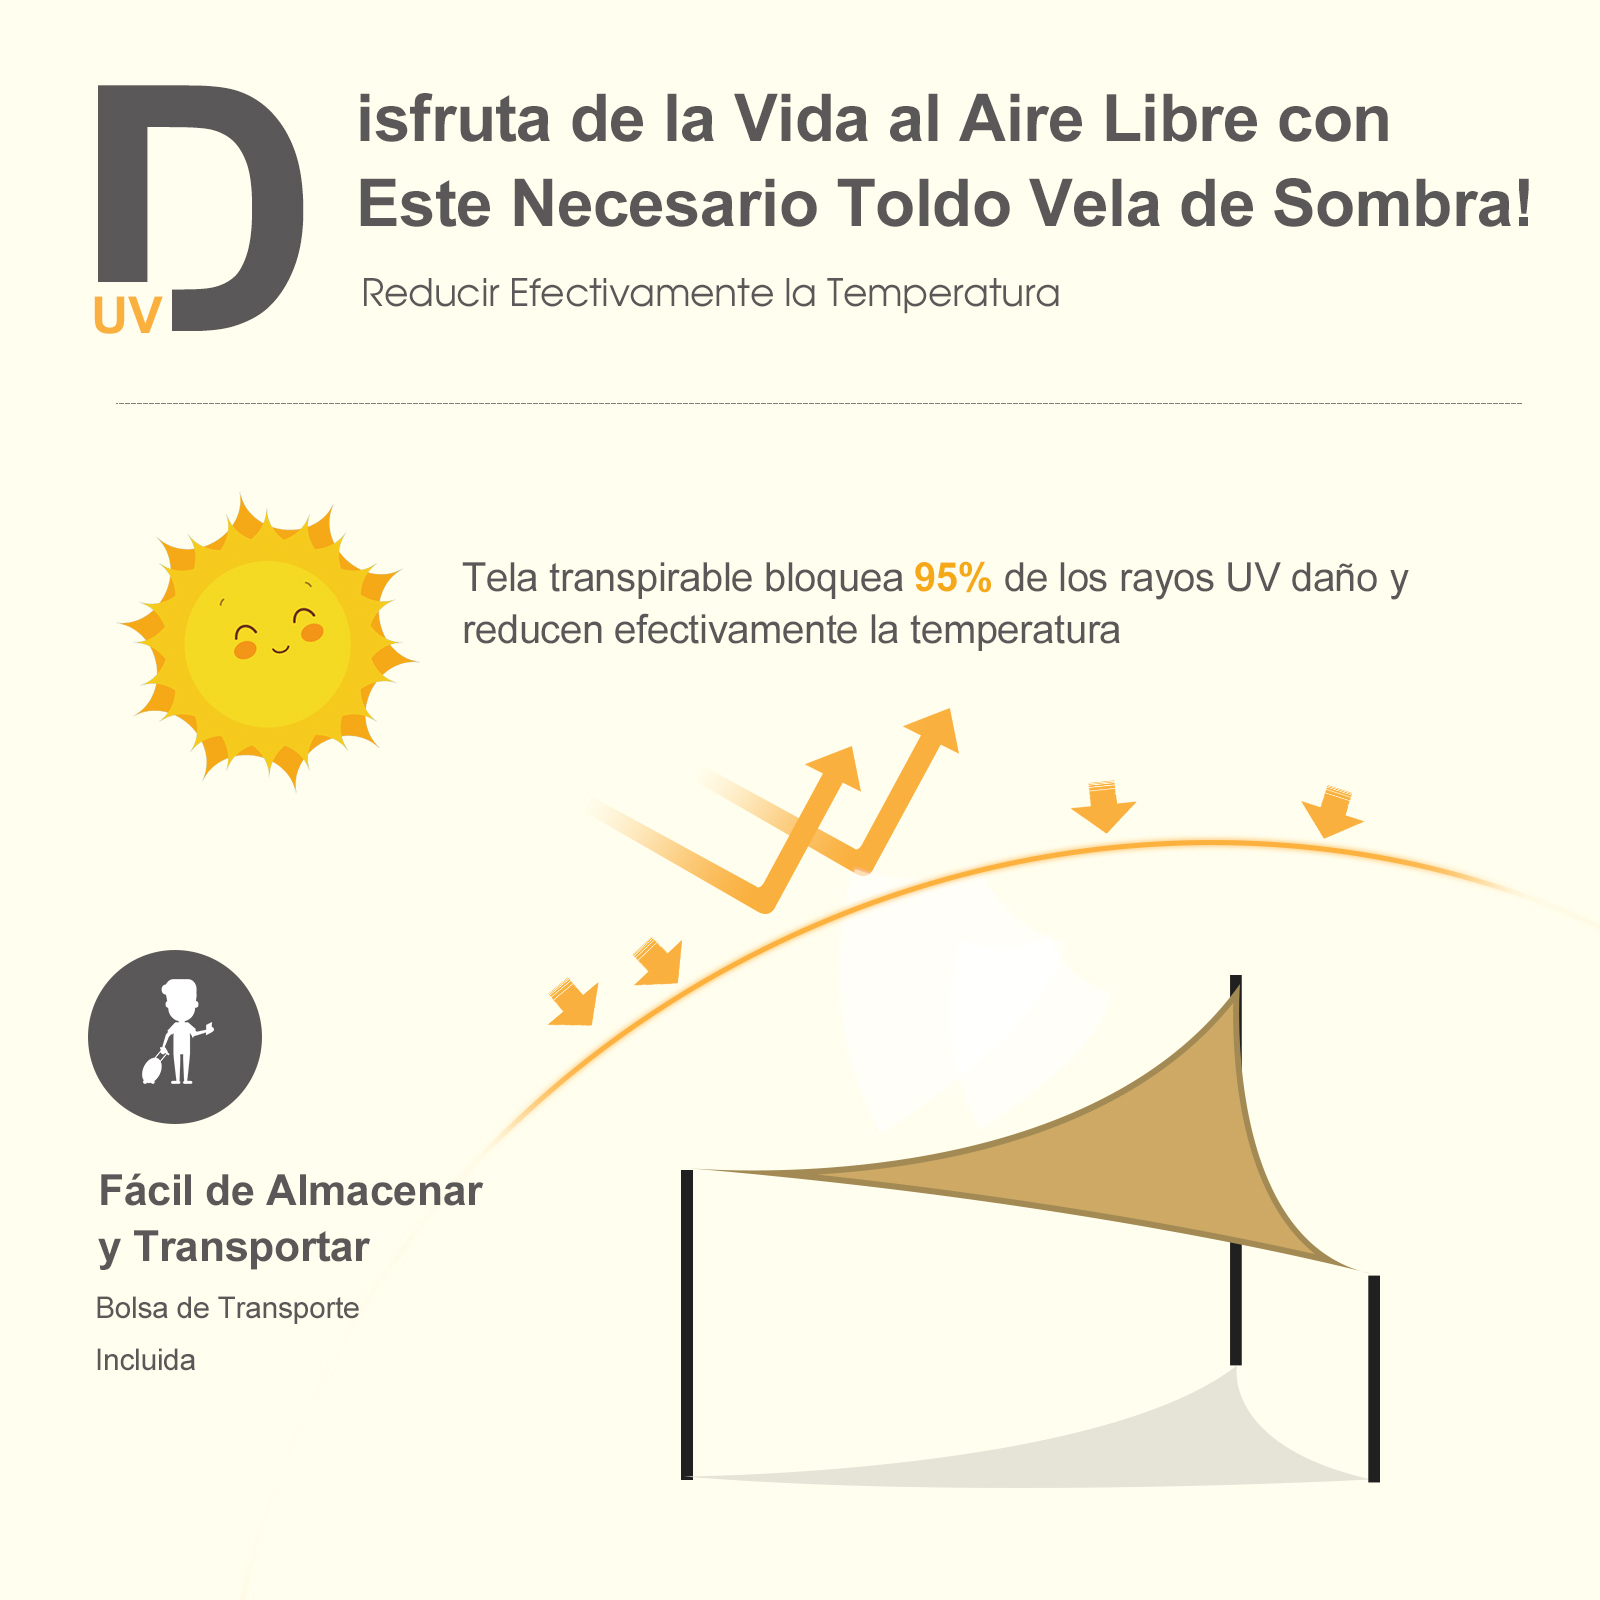 Toldo-Vela-Sombrilla-Parasol-Triangulo-Tejido-de-Poliester-185-g-m-Jardin-Playa miniatura 4